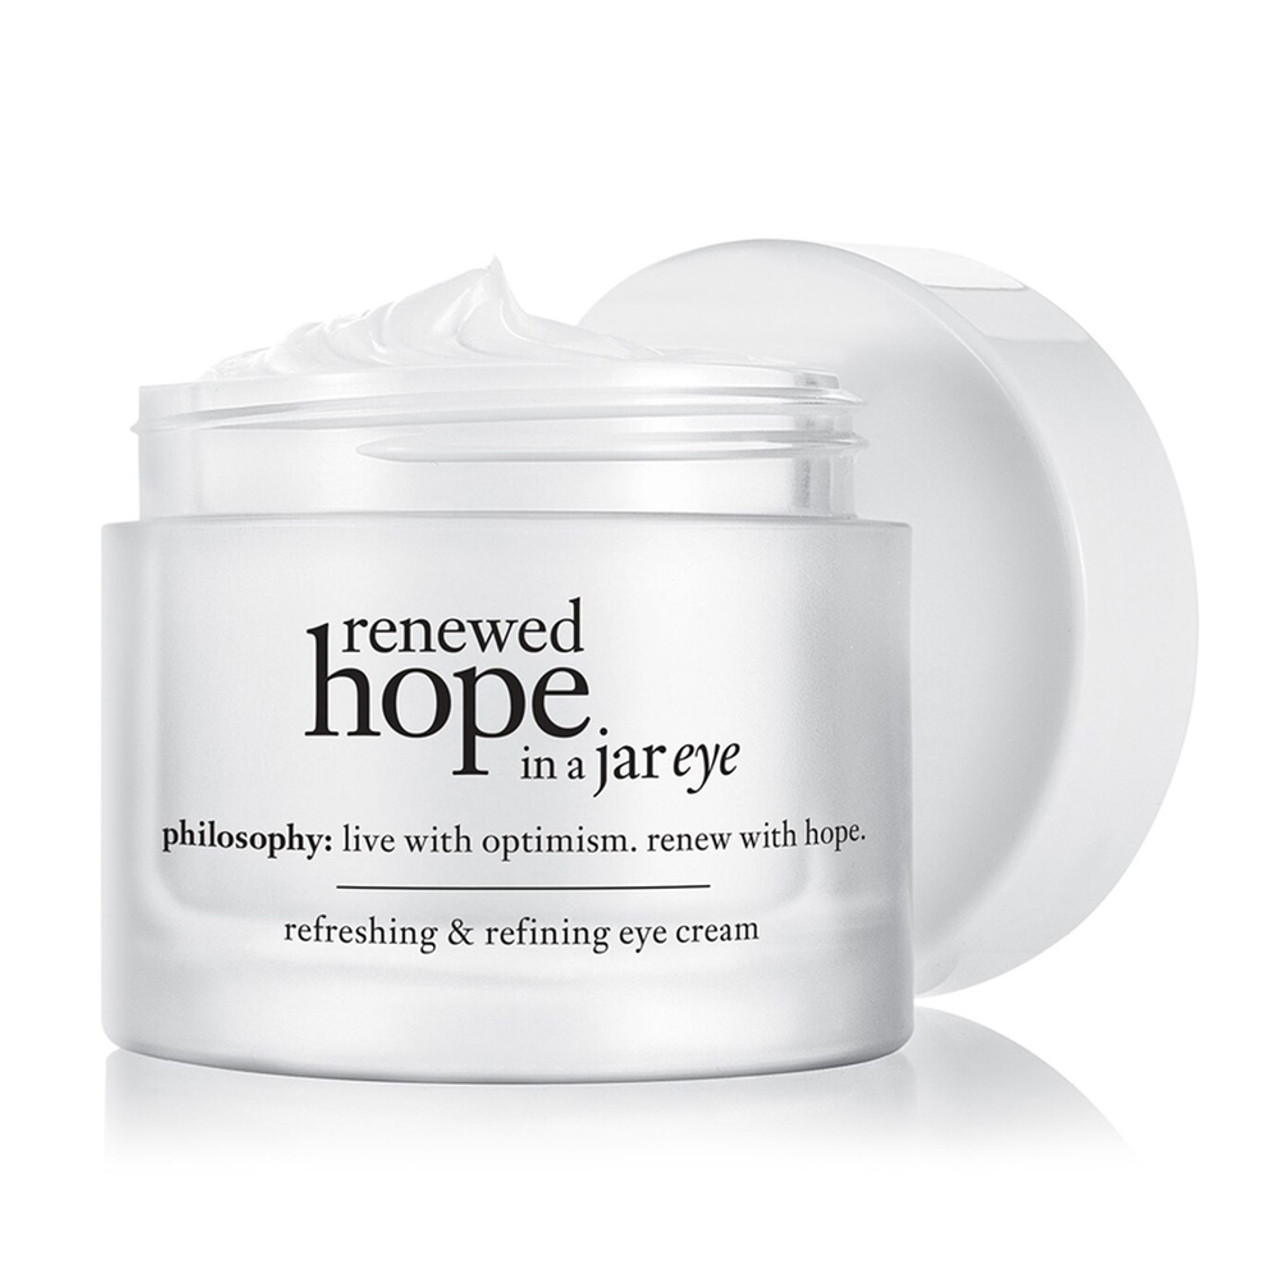 philosophy Renewed Hope in a Jar Refreshing & Refining Eye Cream BeautifiedYou.com